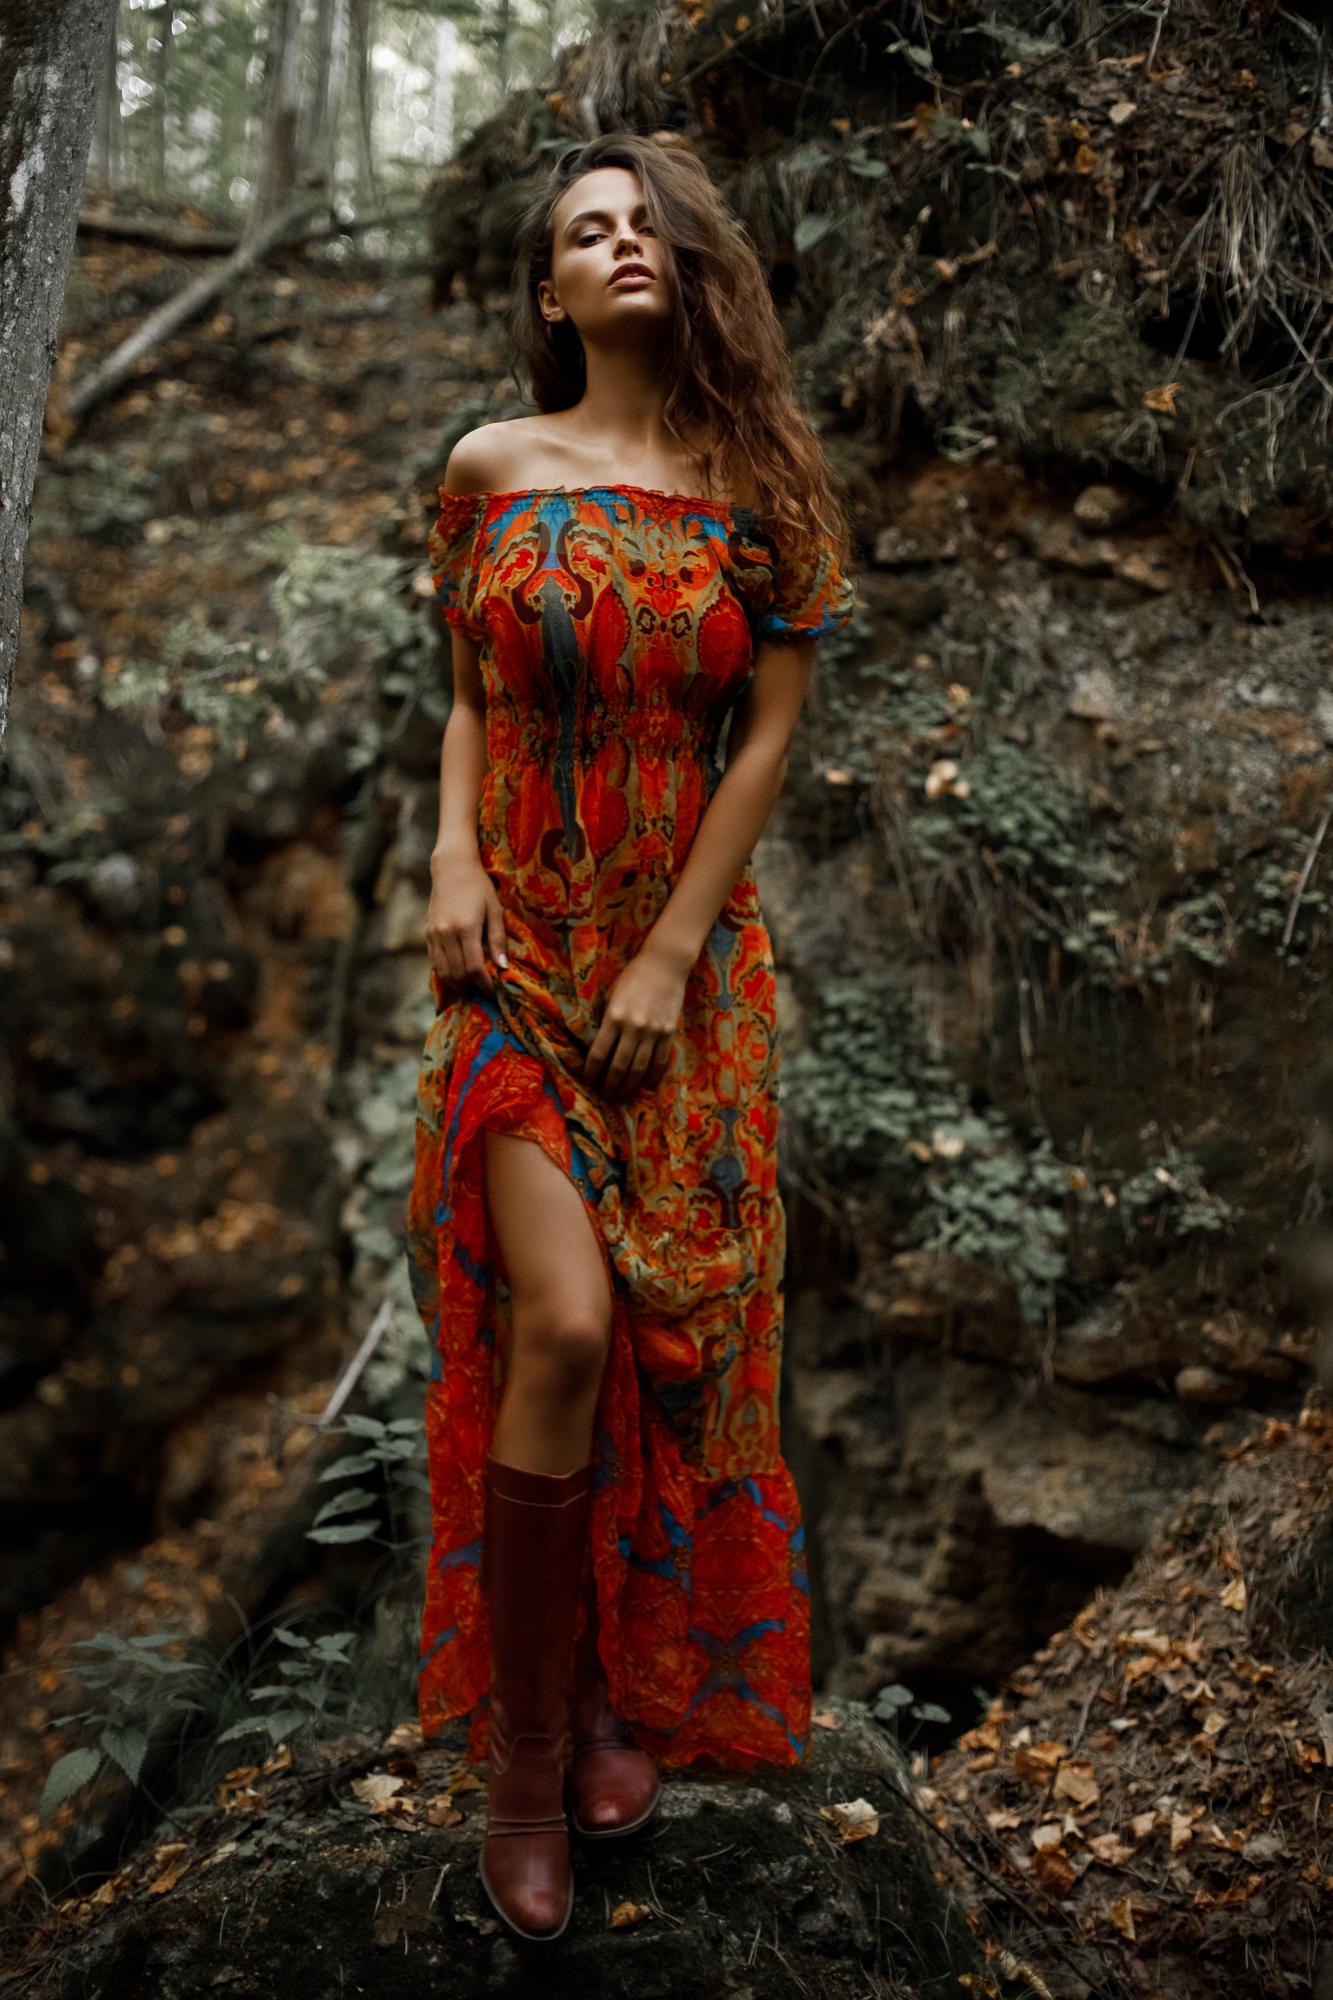 People 1333x2000 Alexander Sasin Lilia model women brunette women outdoors long skirt long hair bare shoulders strapless dress red dress portrait display